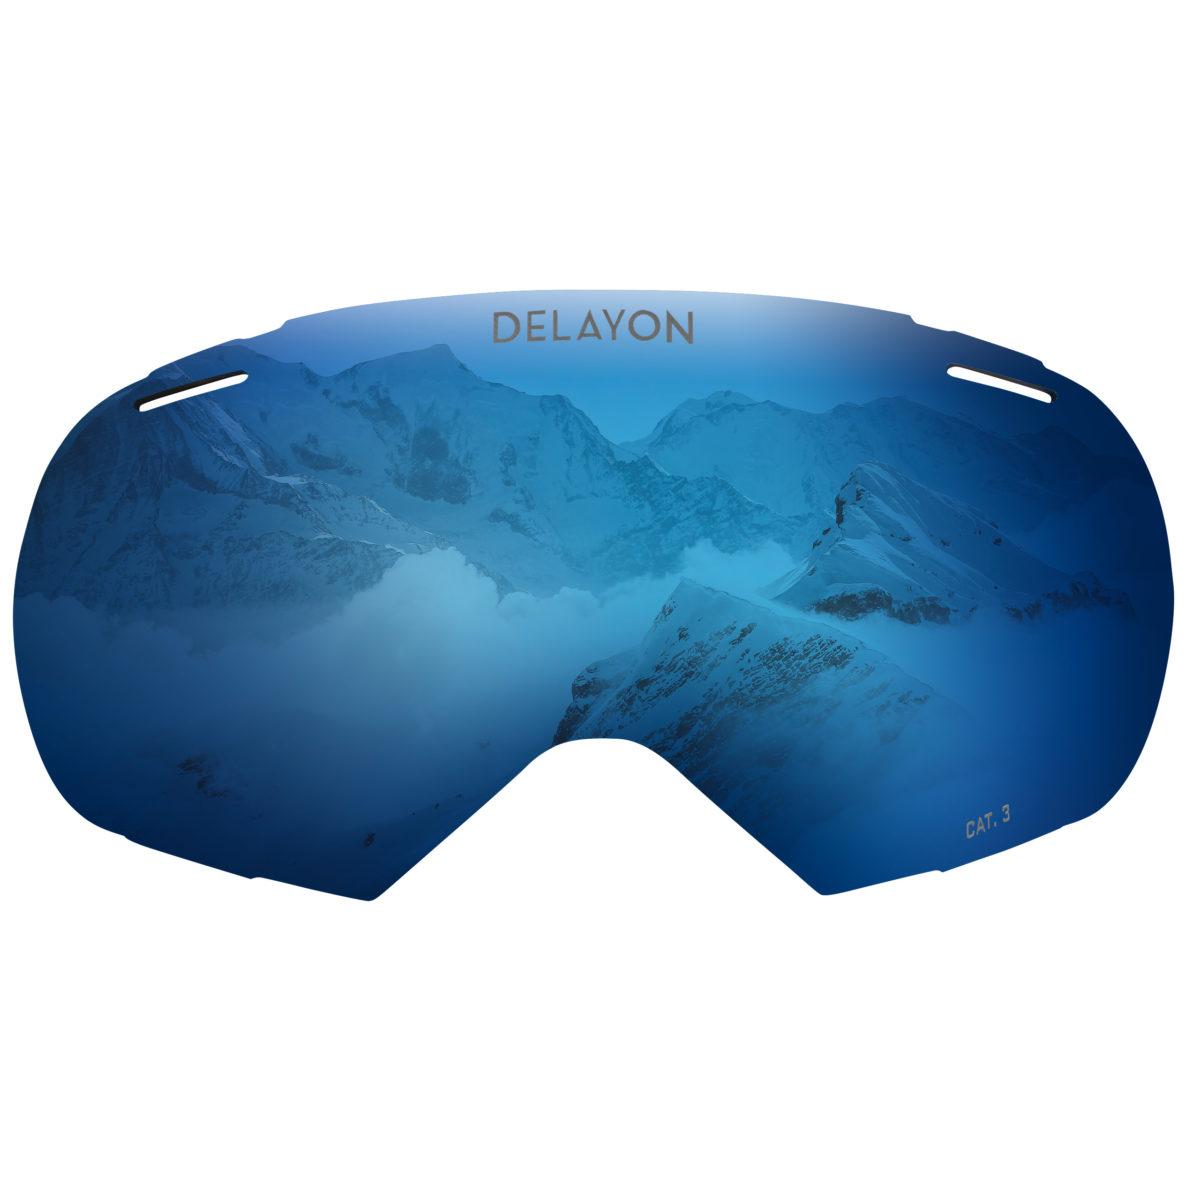 DELAYON Eyewear Puzzle Goggle Space Blue Lens